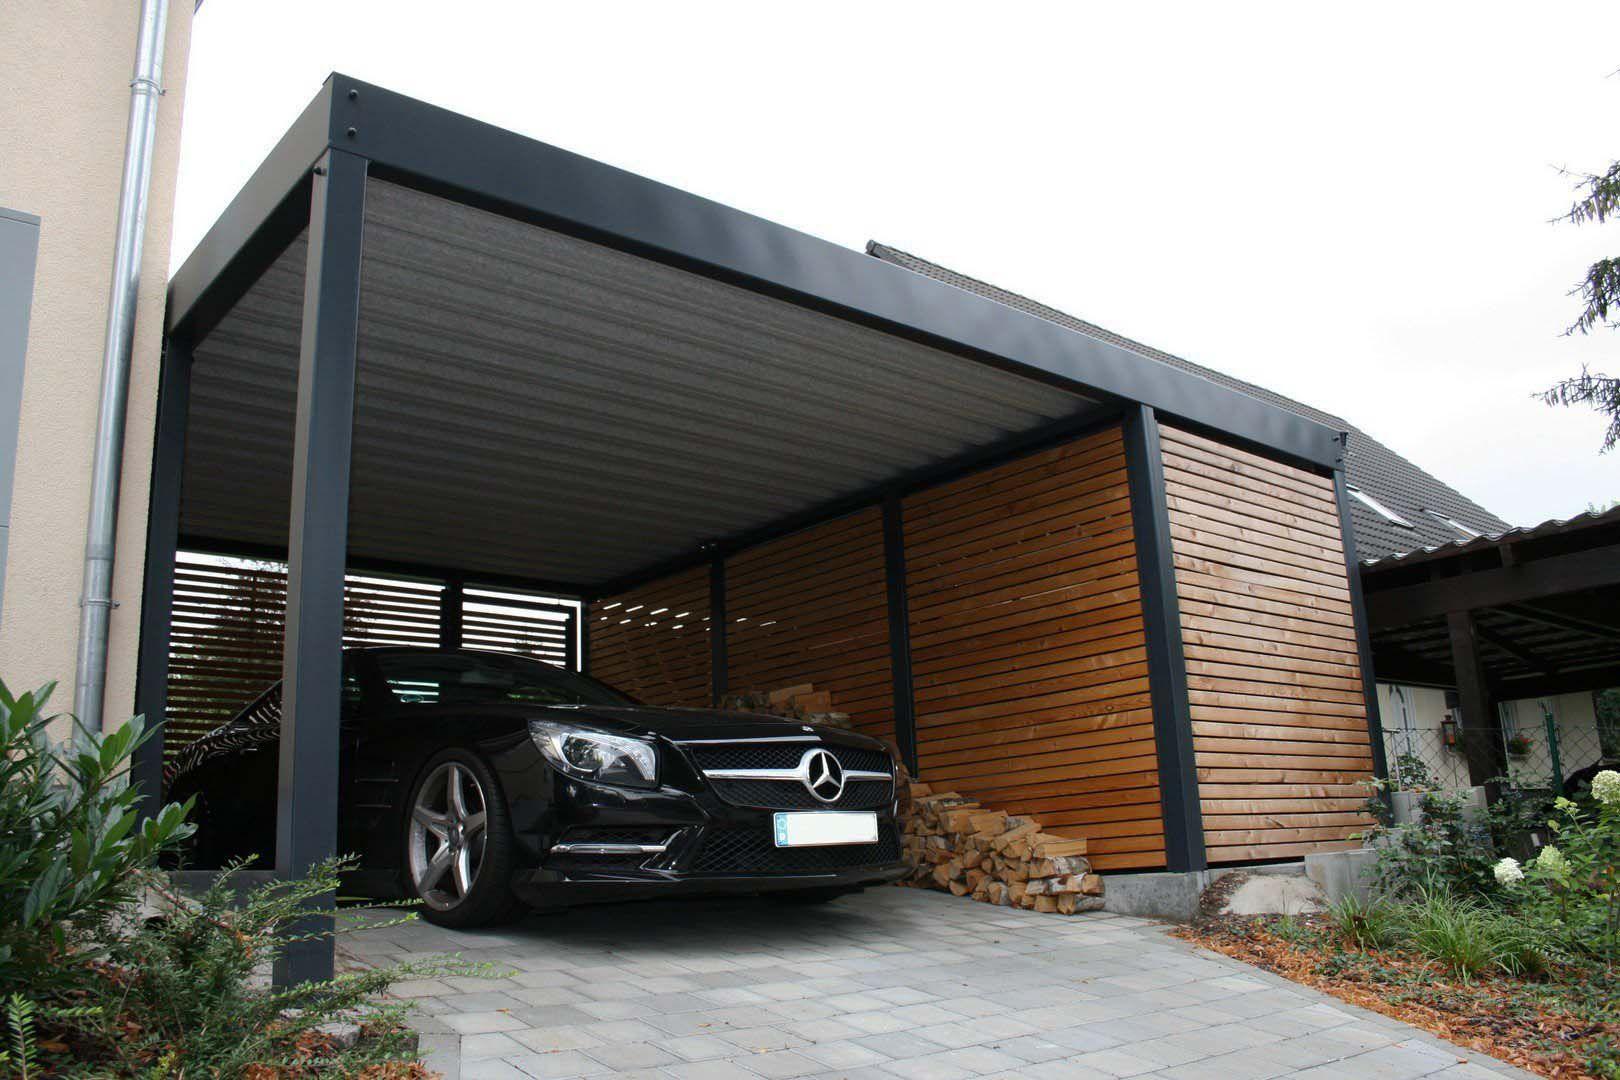 Metallcarport stahlcarport kaufen metall carport preise mit